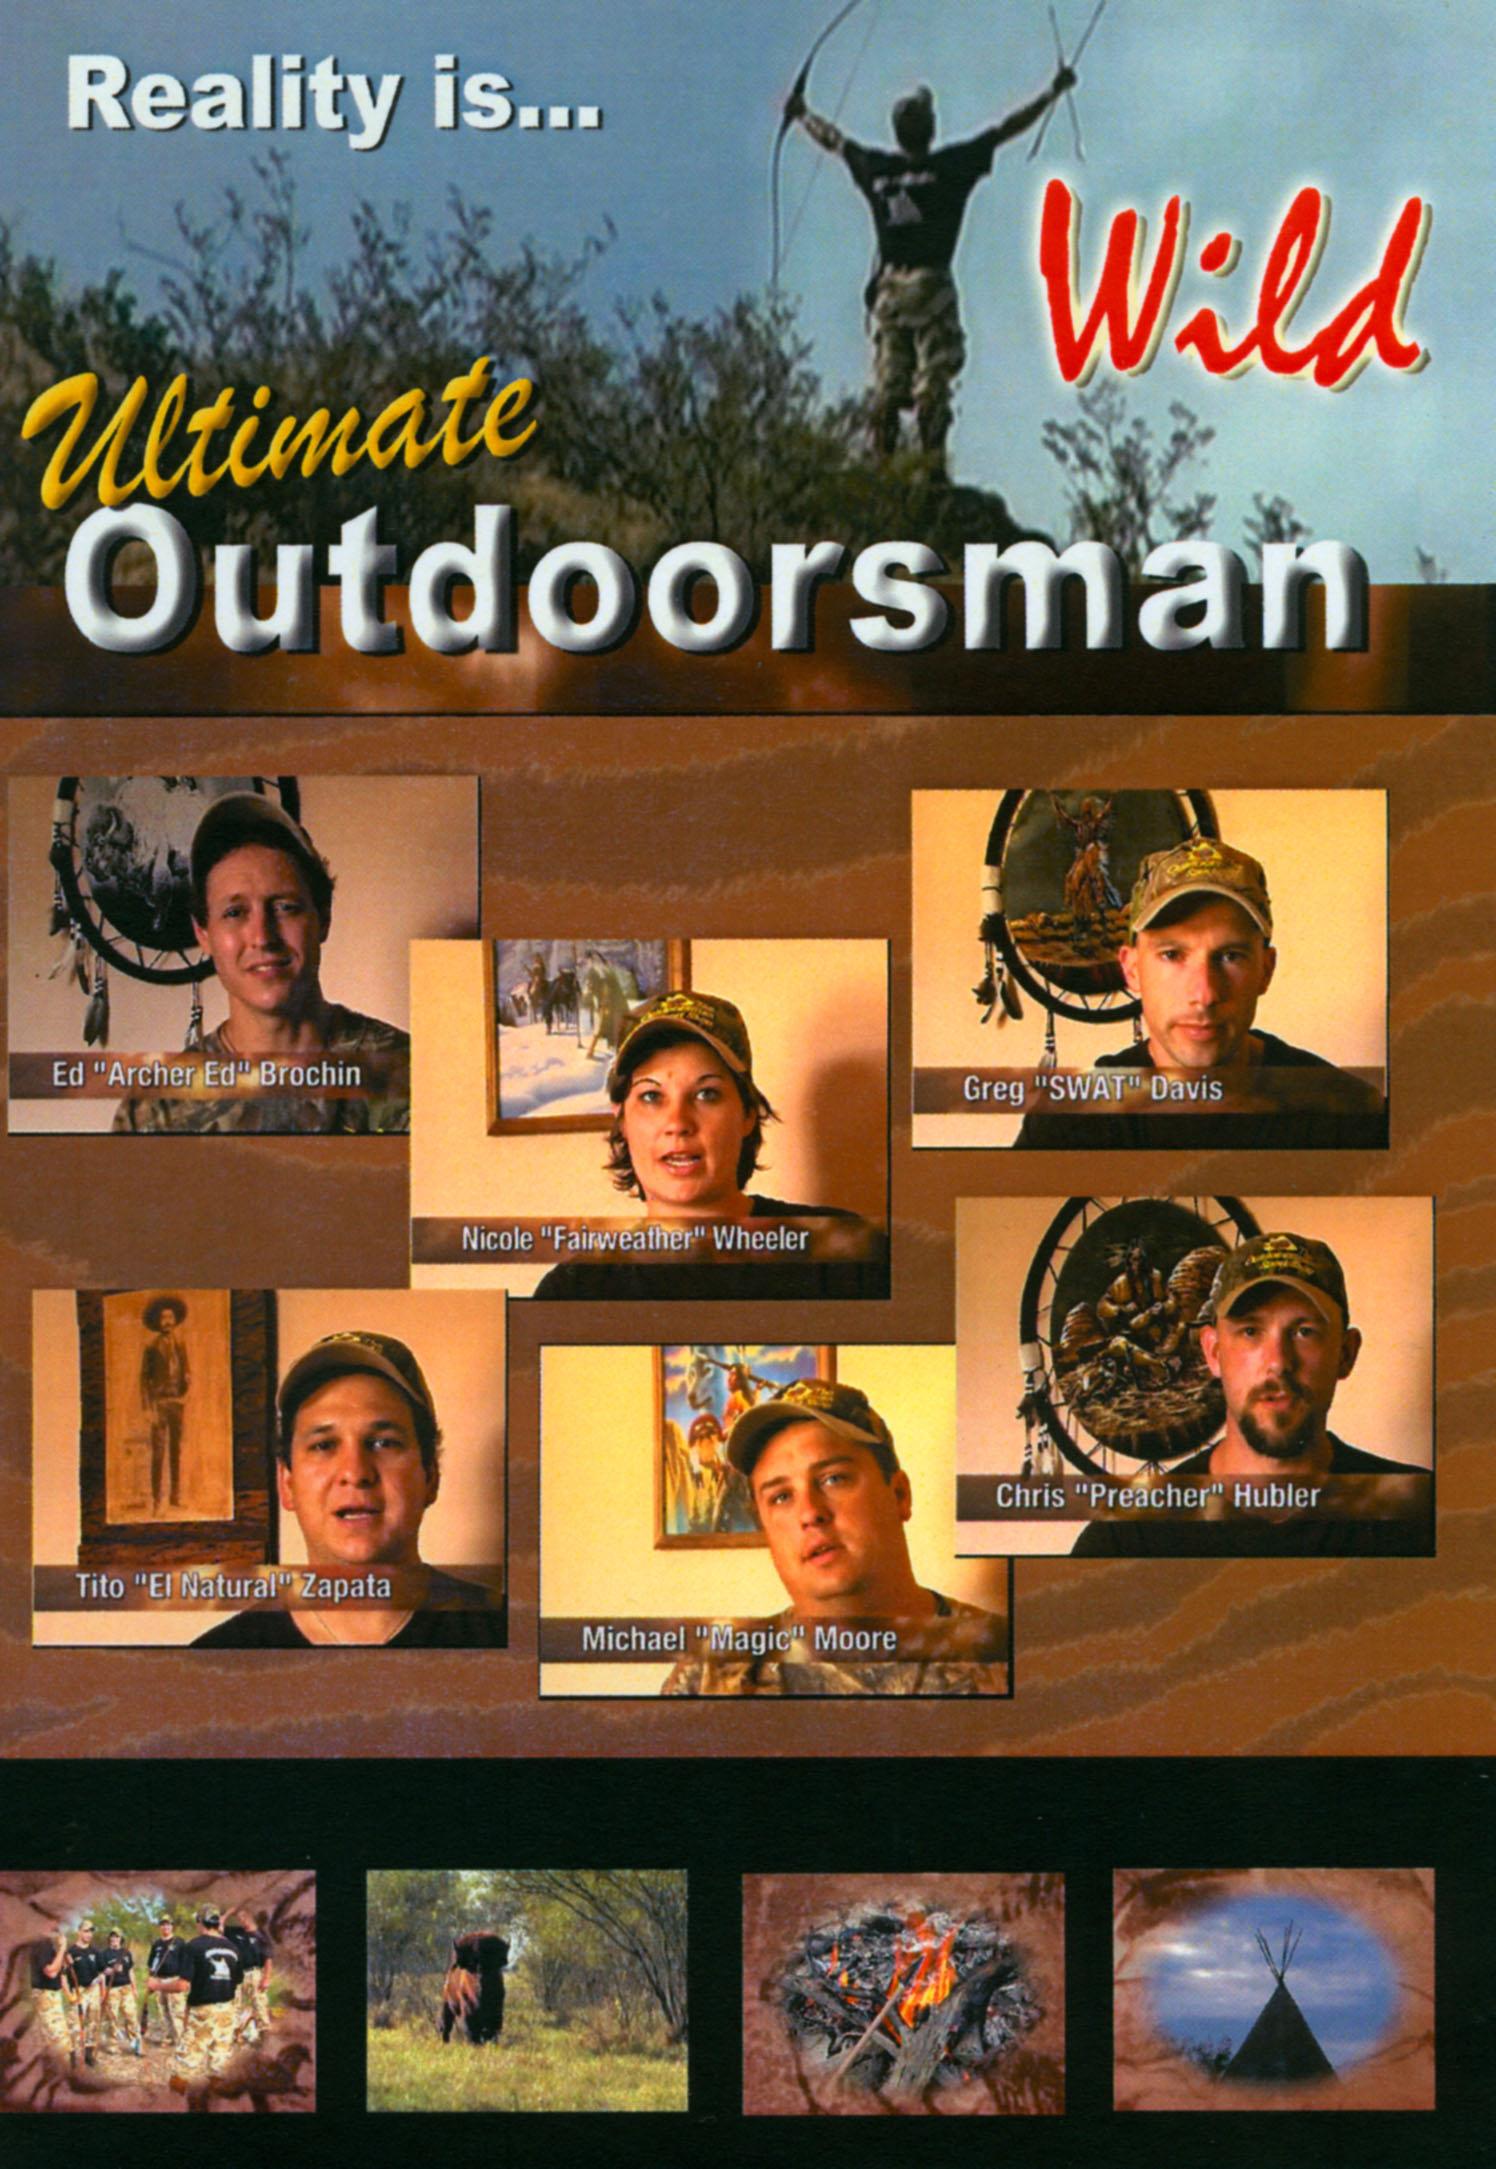 Ultimate Outdoorsman